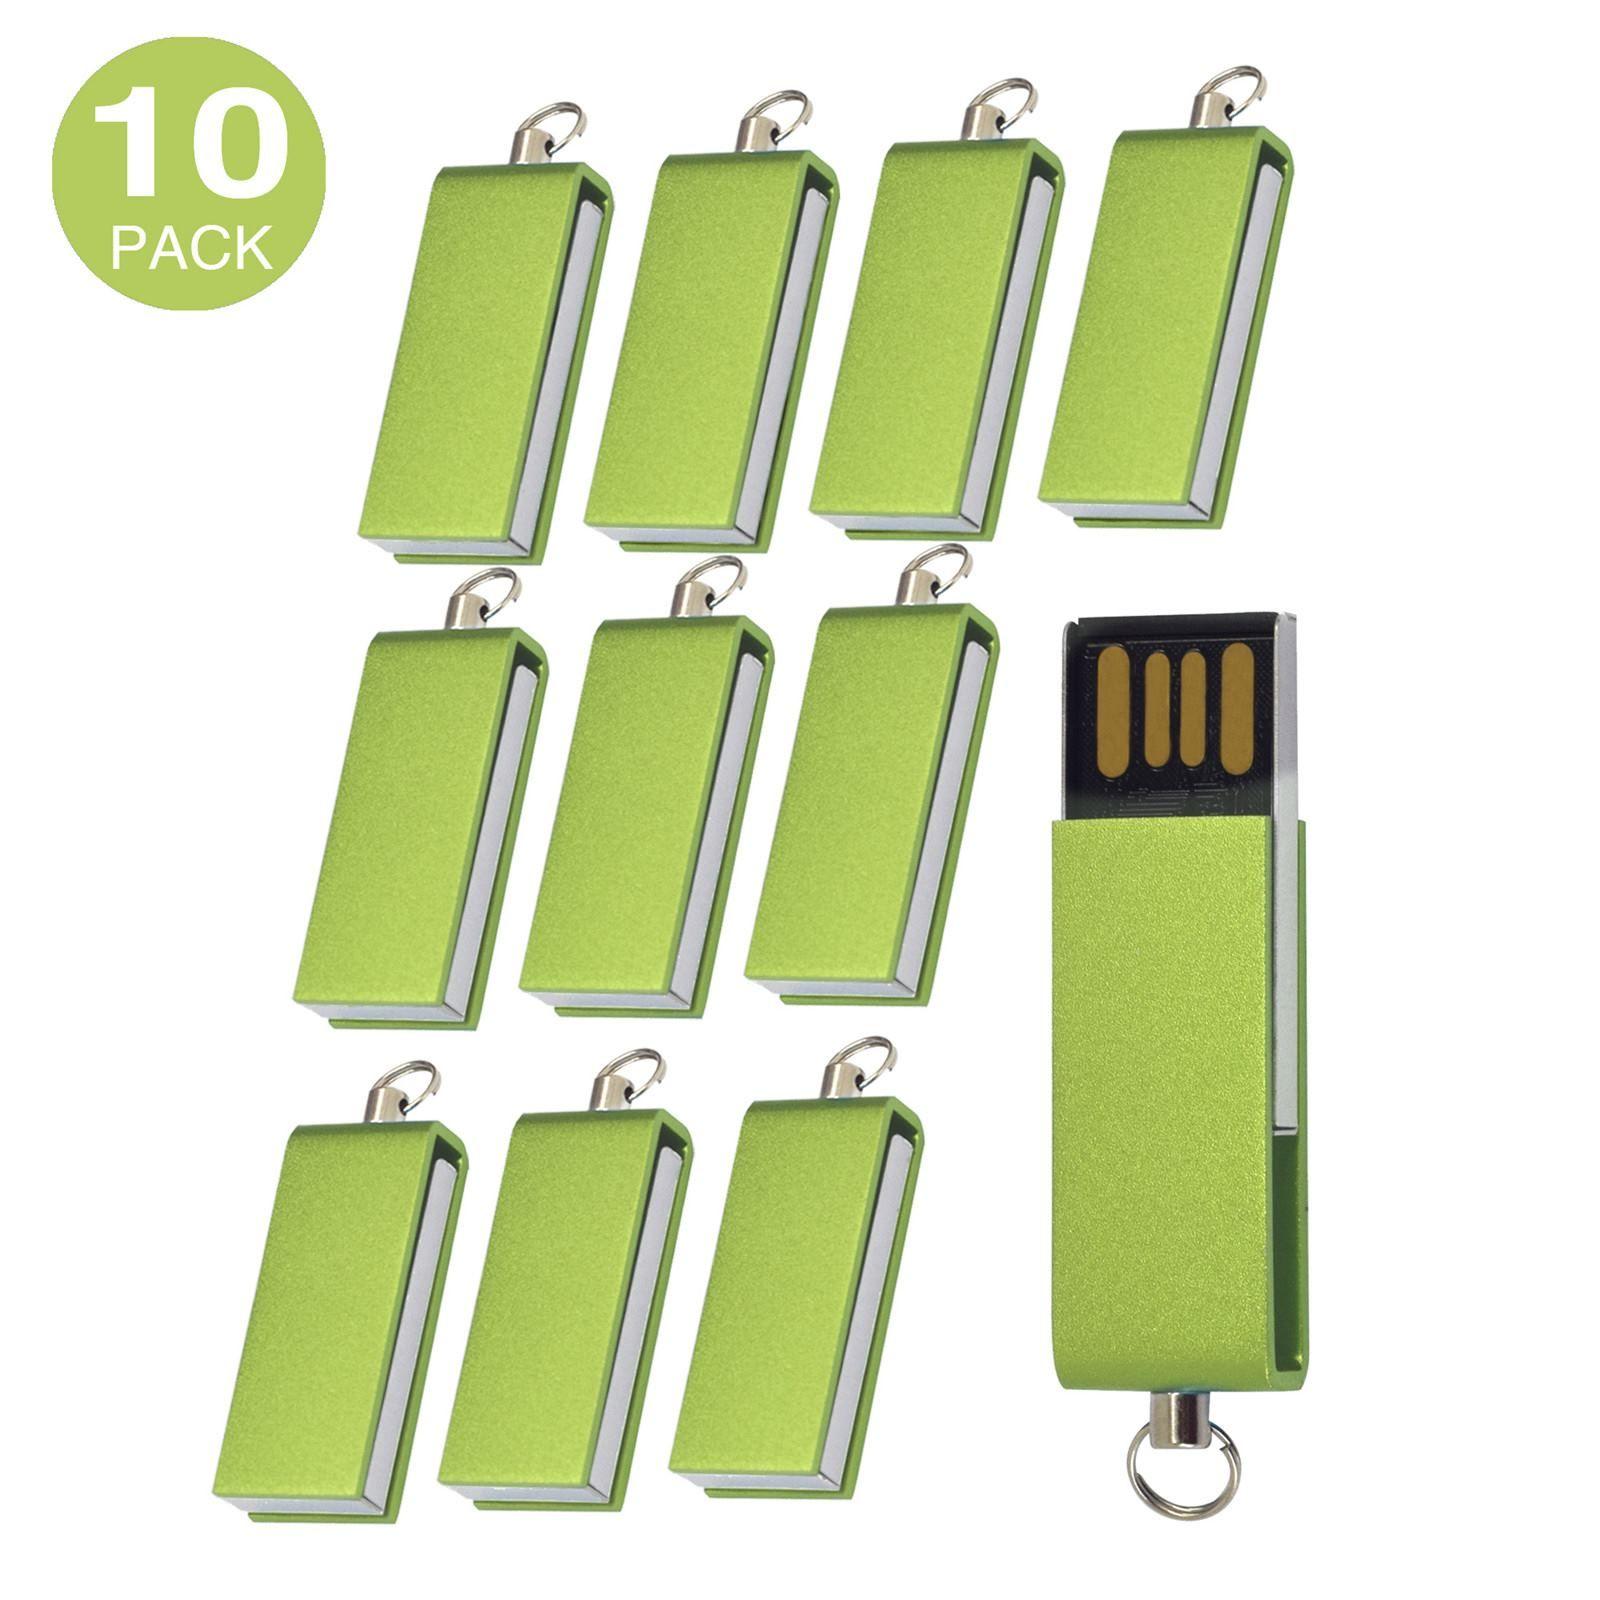 Colorful 10 Pack USB Flash Drives Rotating Thumb Pen Drive Memory Stick 1GB-16GB